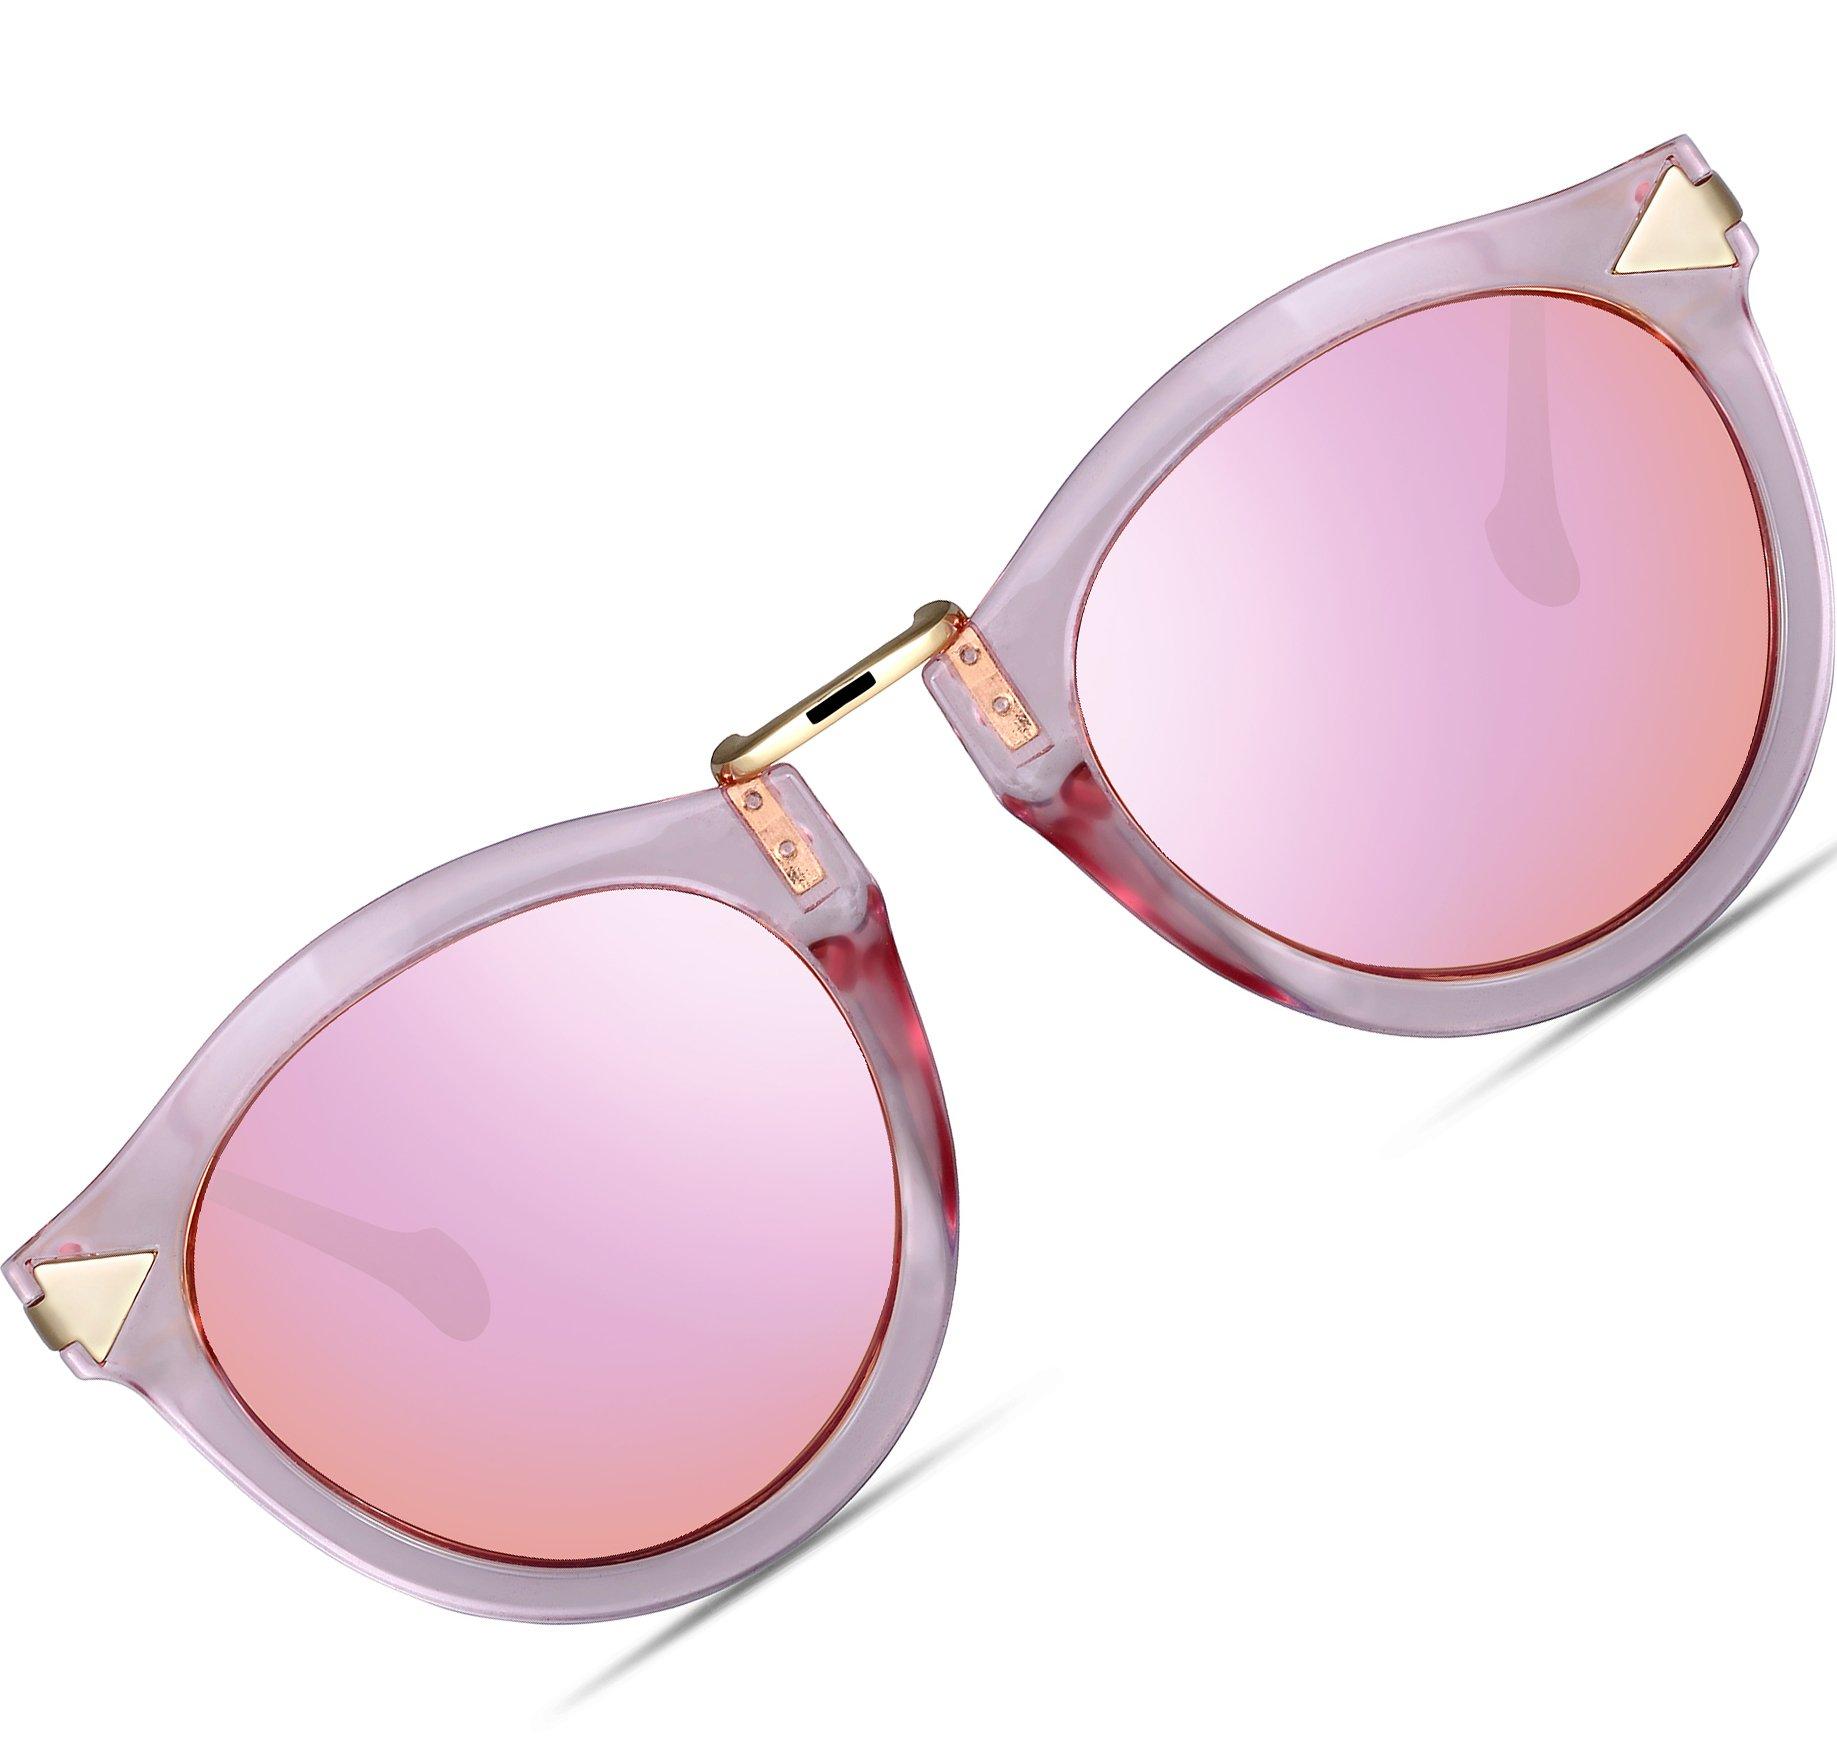 ATTCL Vintage Fashion Round Arrow Style Wayfarer Polarized Sunglasses for Women 1189-Pink by ATTCL